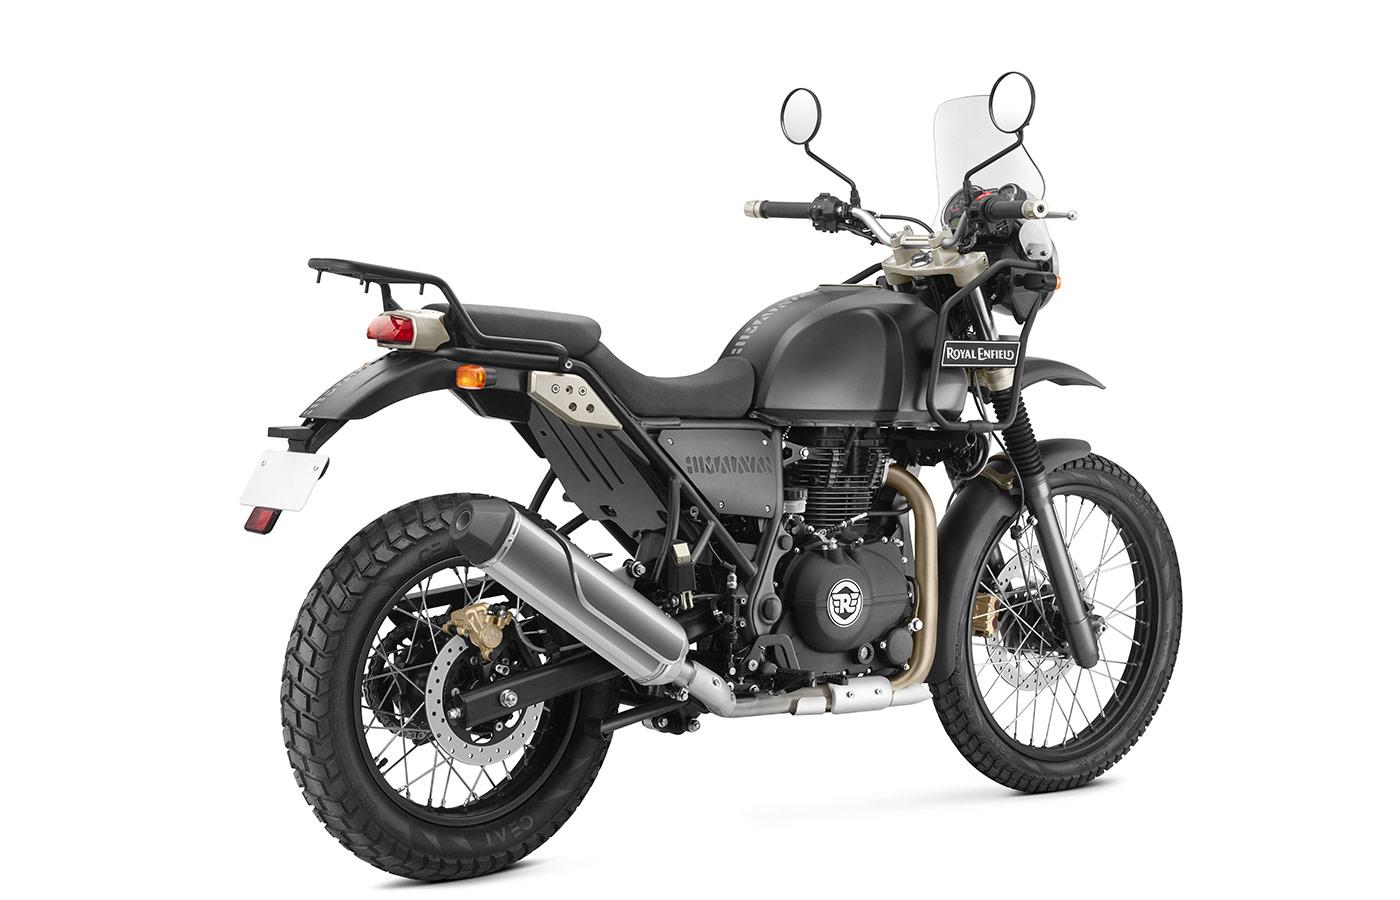 royalenfield-himalayan-bike-6